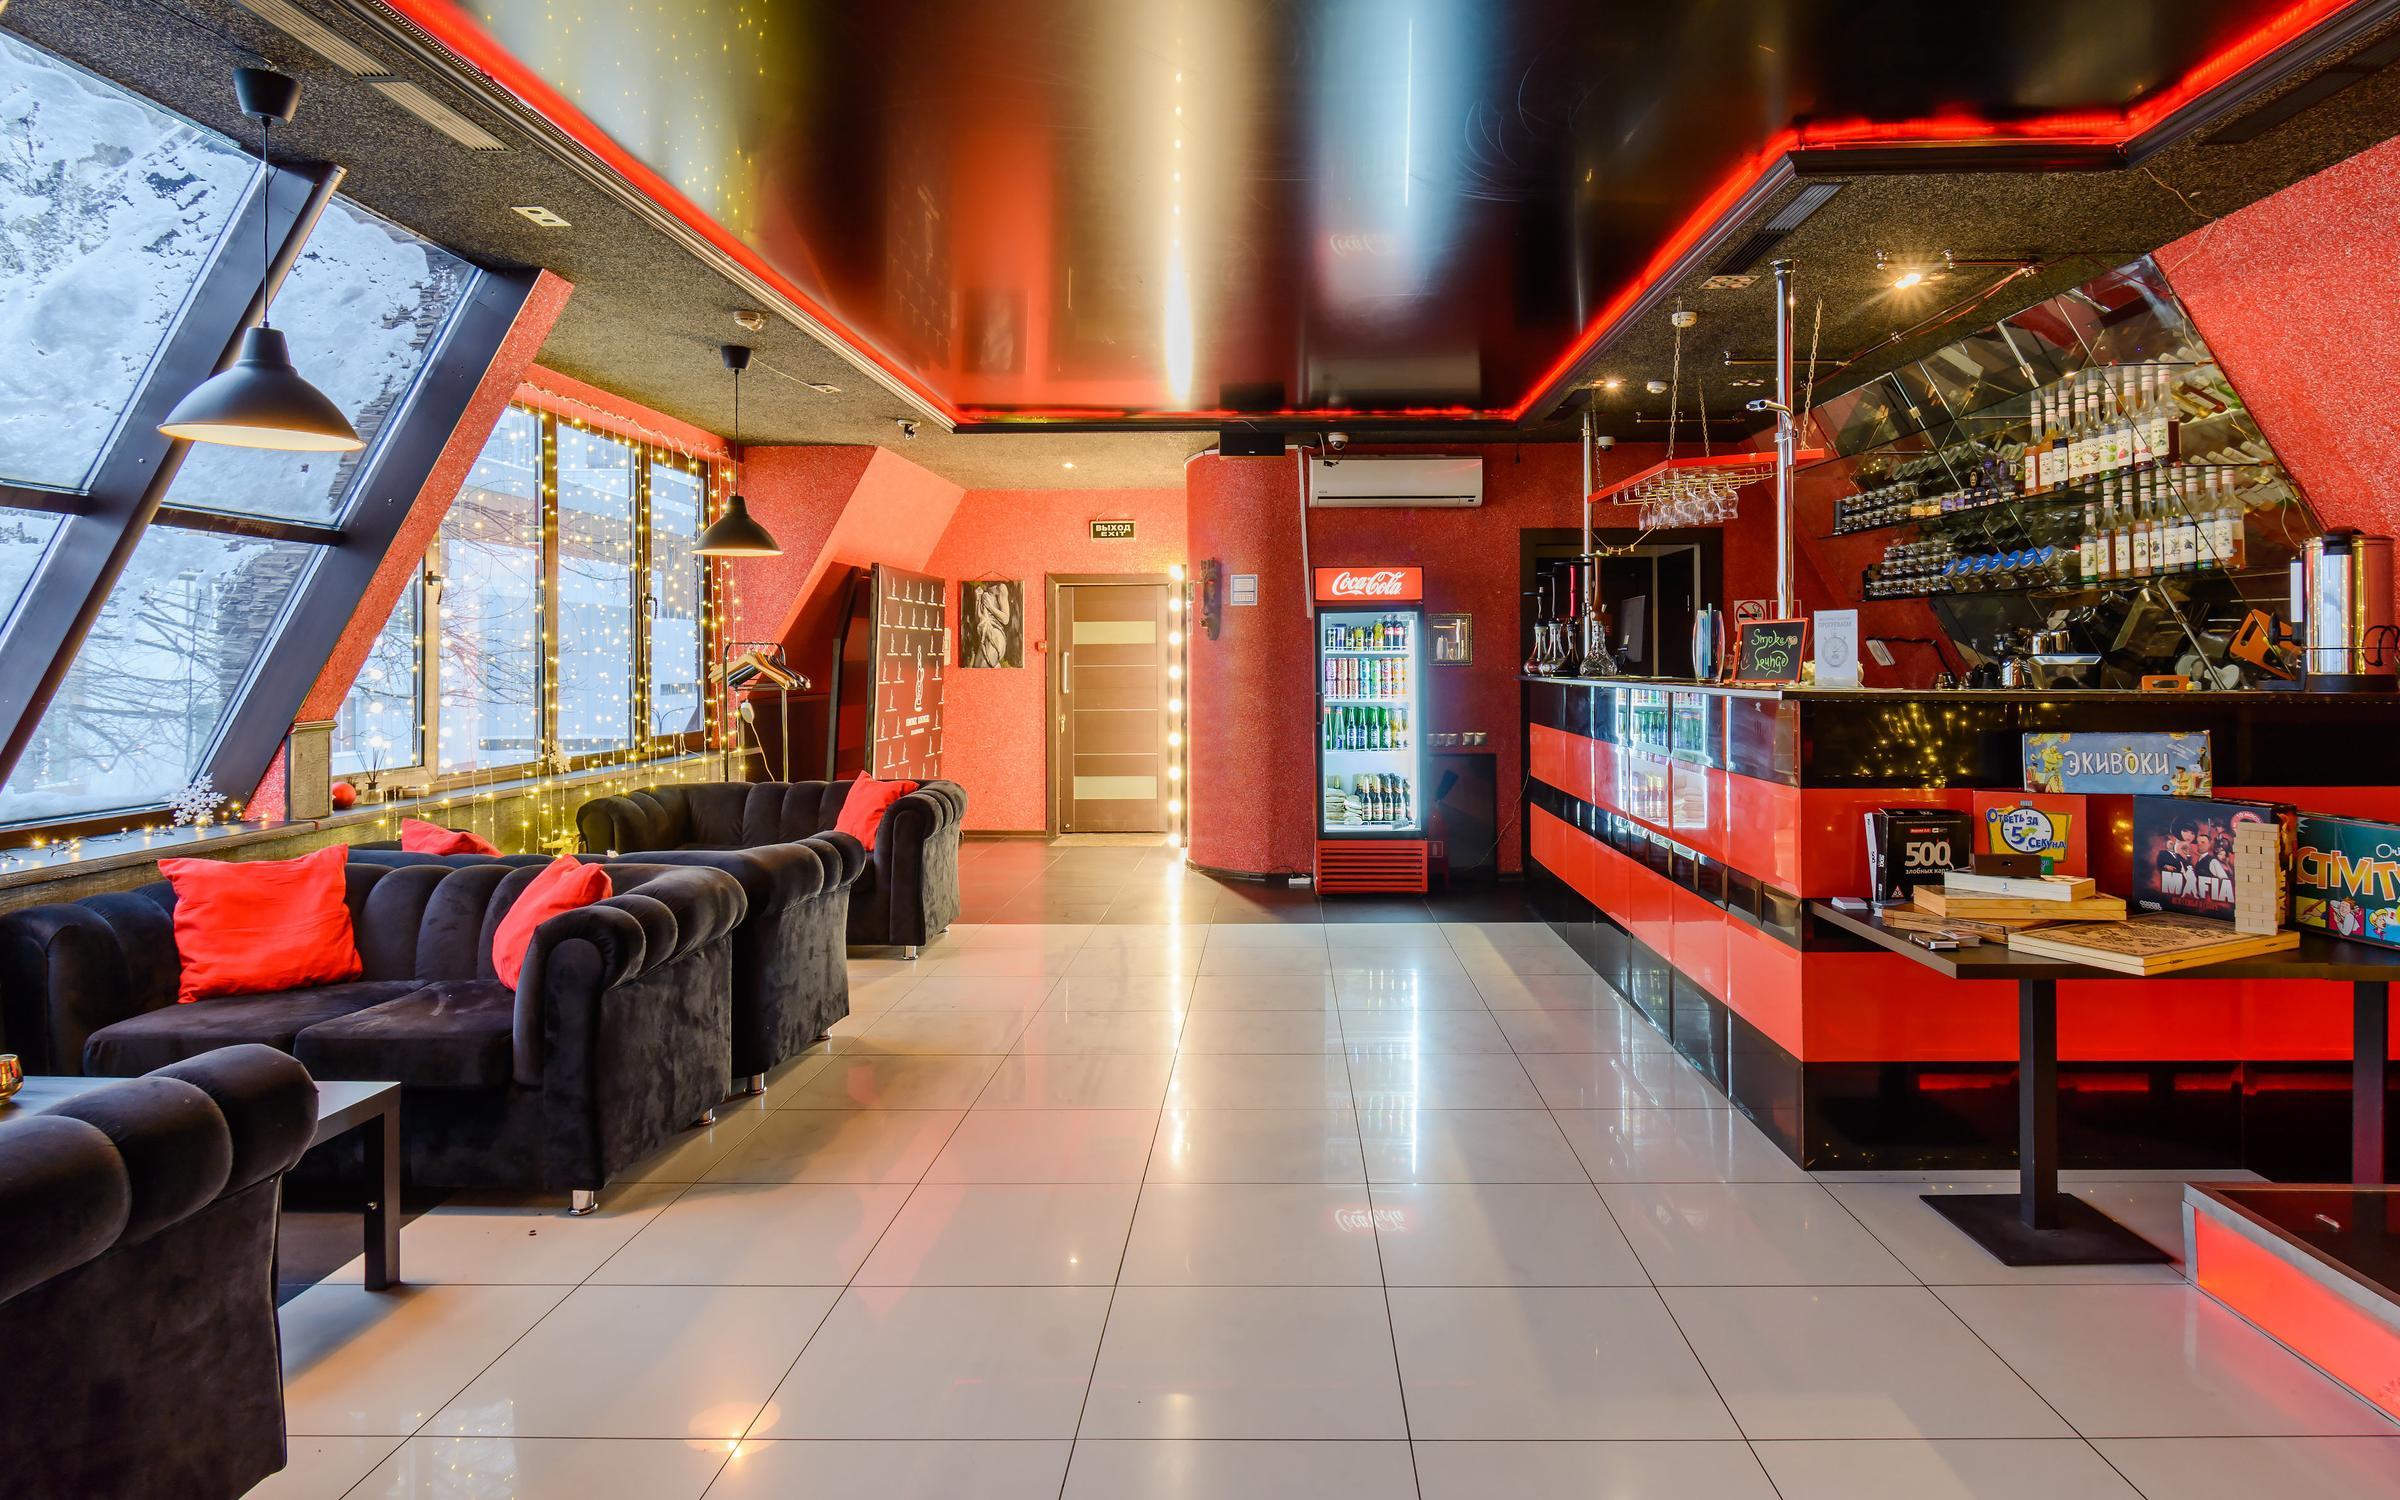 фотография Центра паровых коктейлей Smoke Lounge Кальянная №1 на улице Лётчика Бабушкина